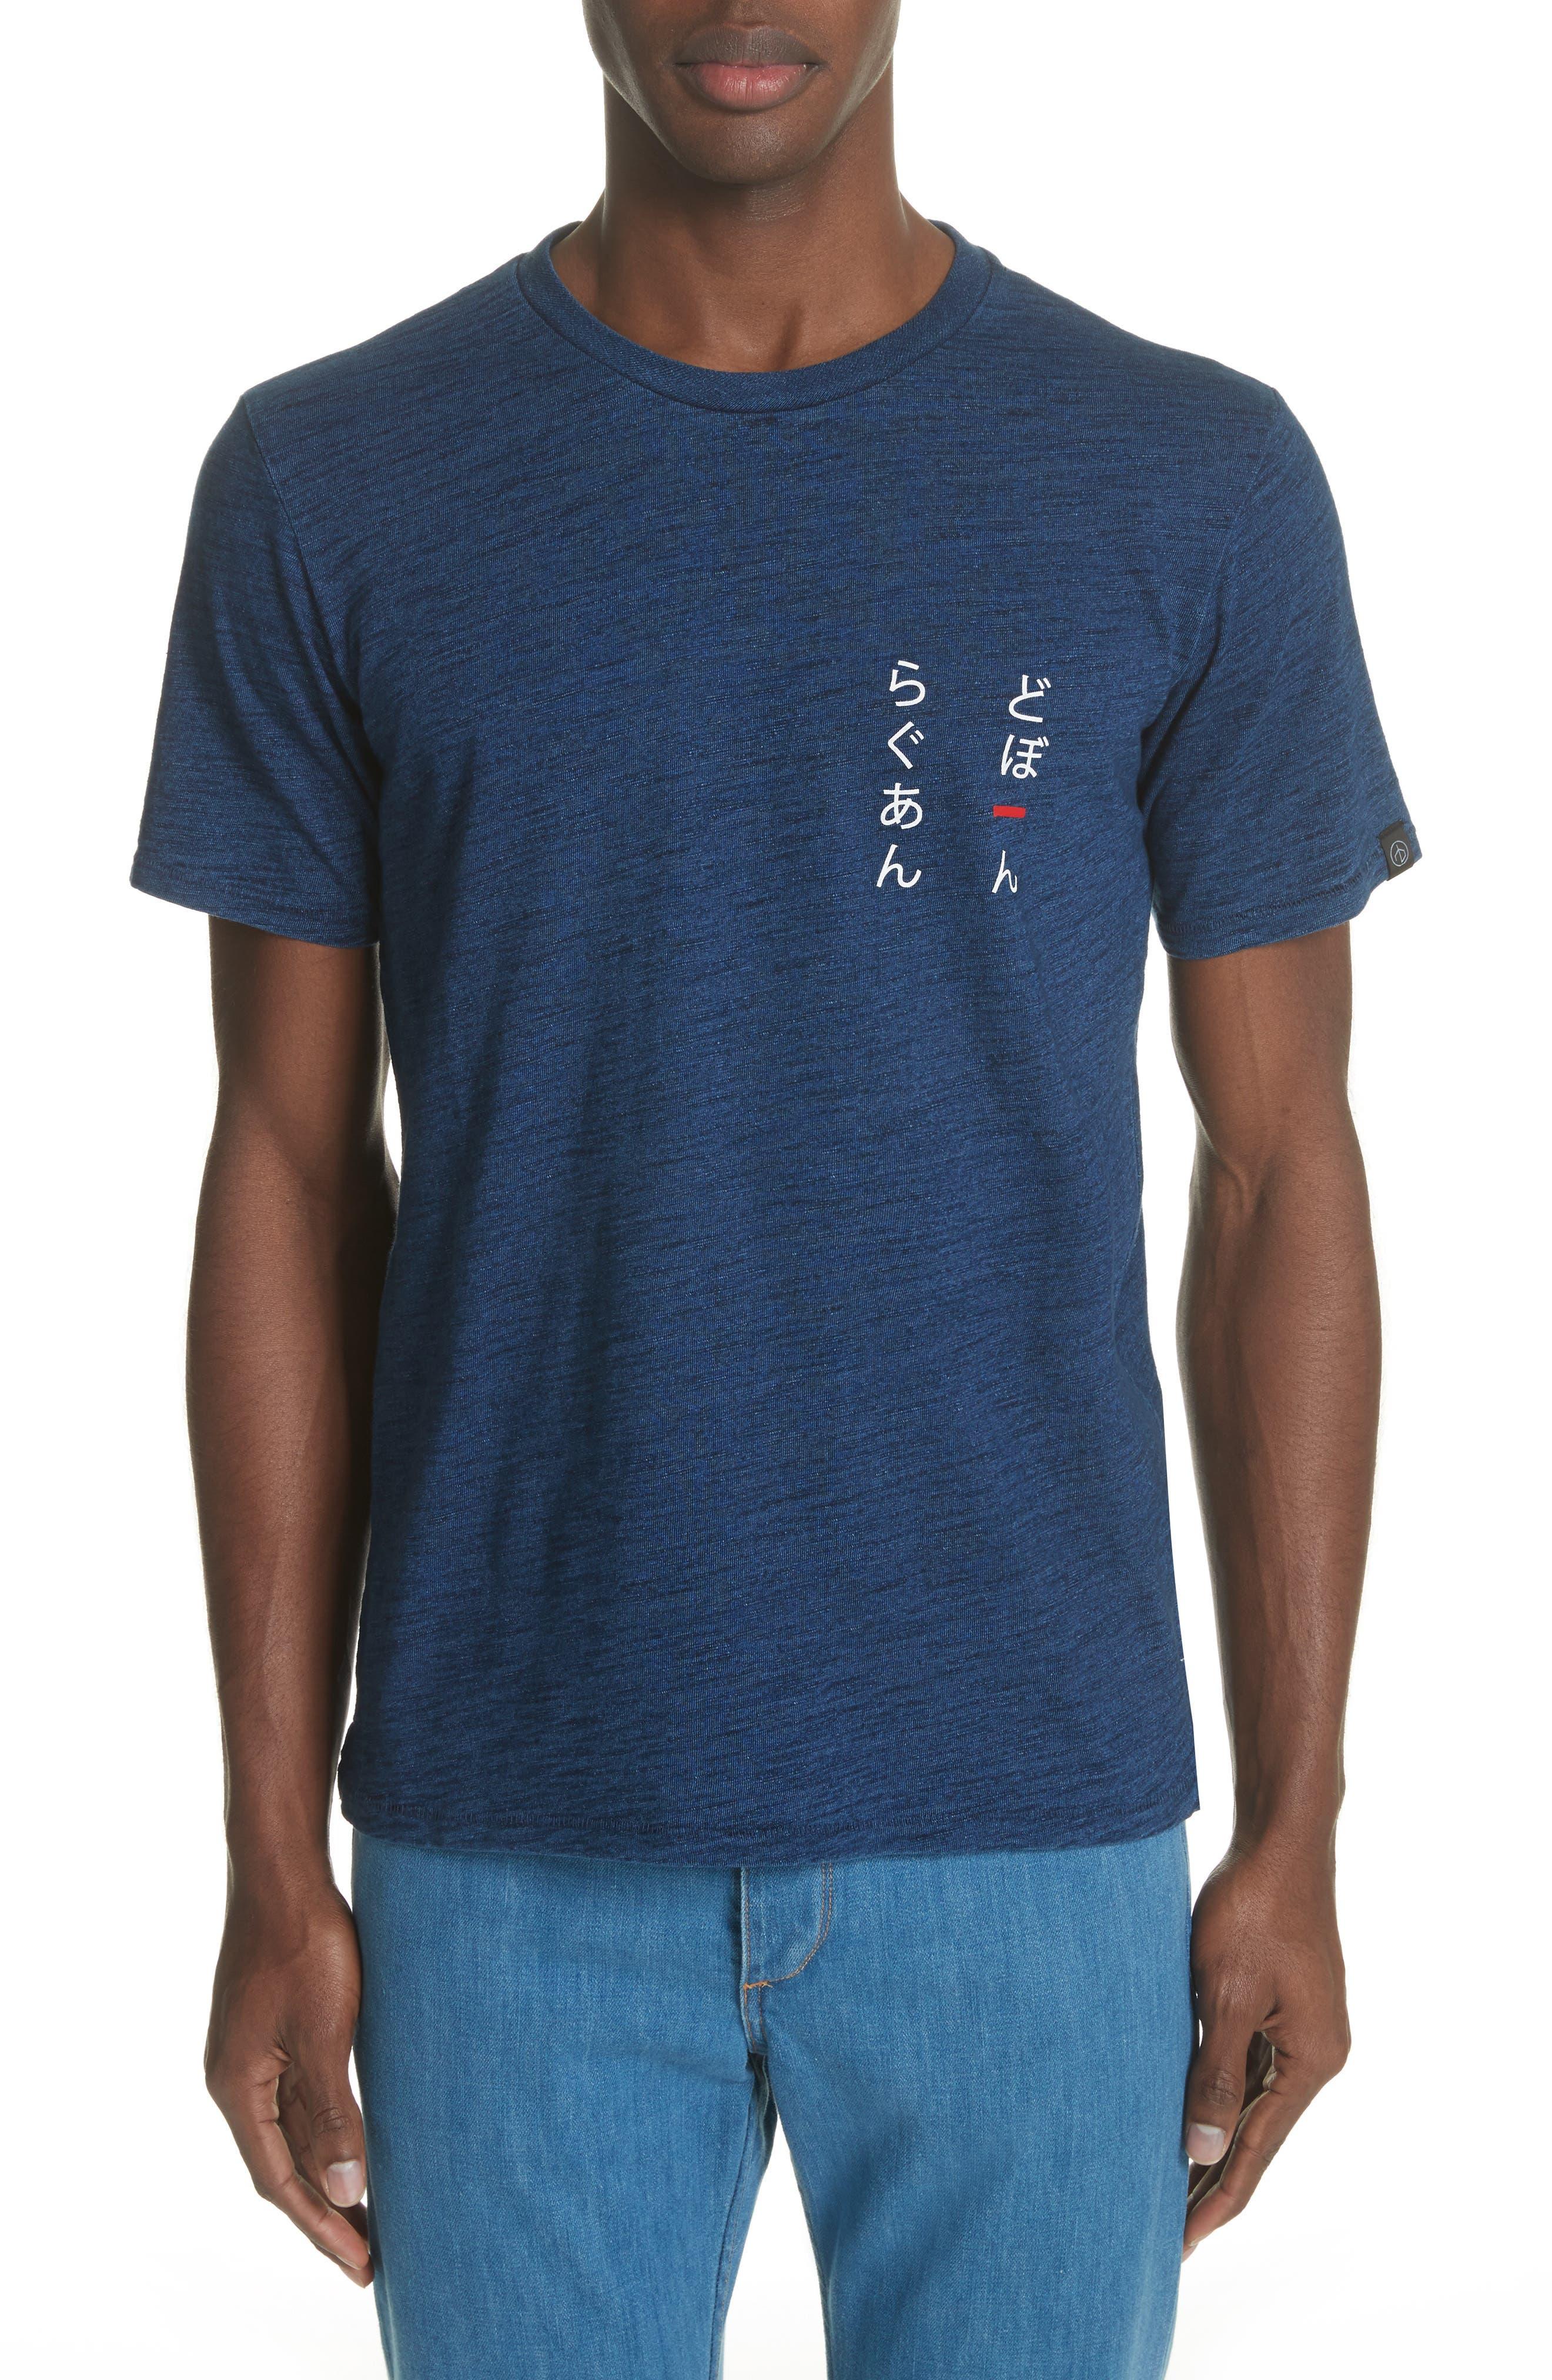 Alternate Image 1 Selected - rag & bone Graphic T-Shirt